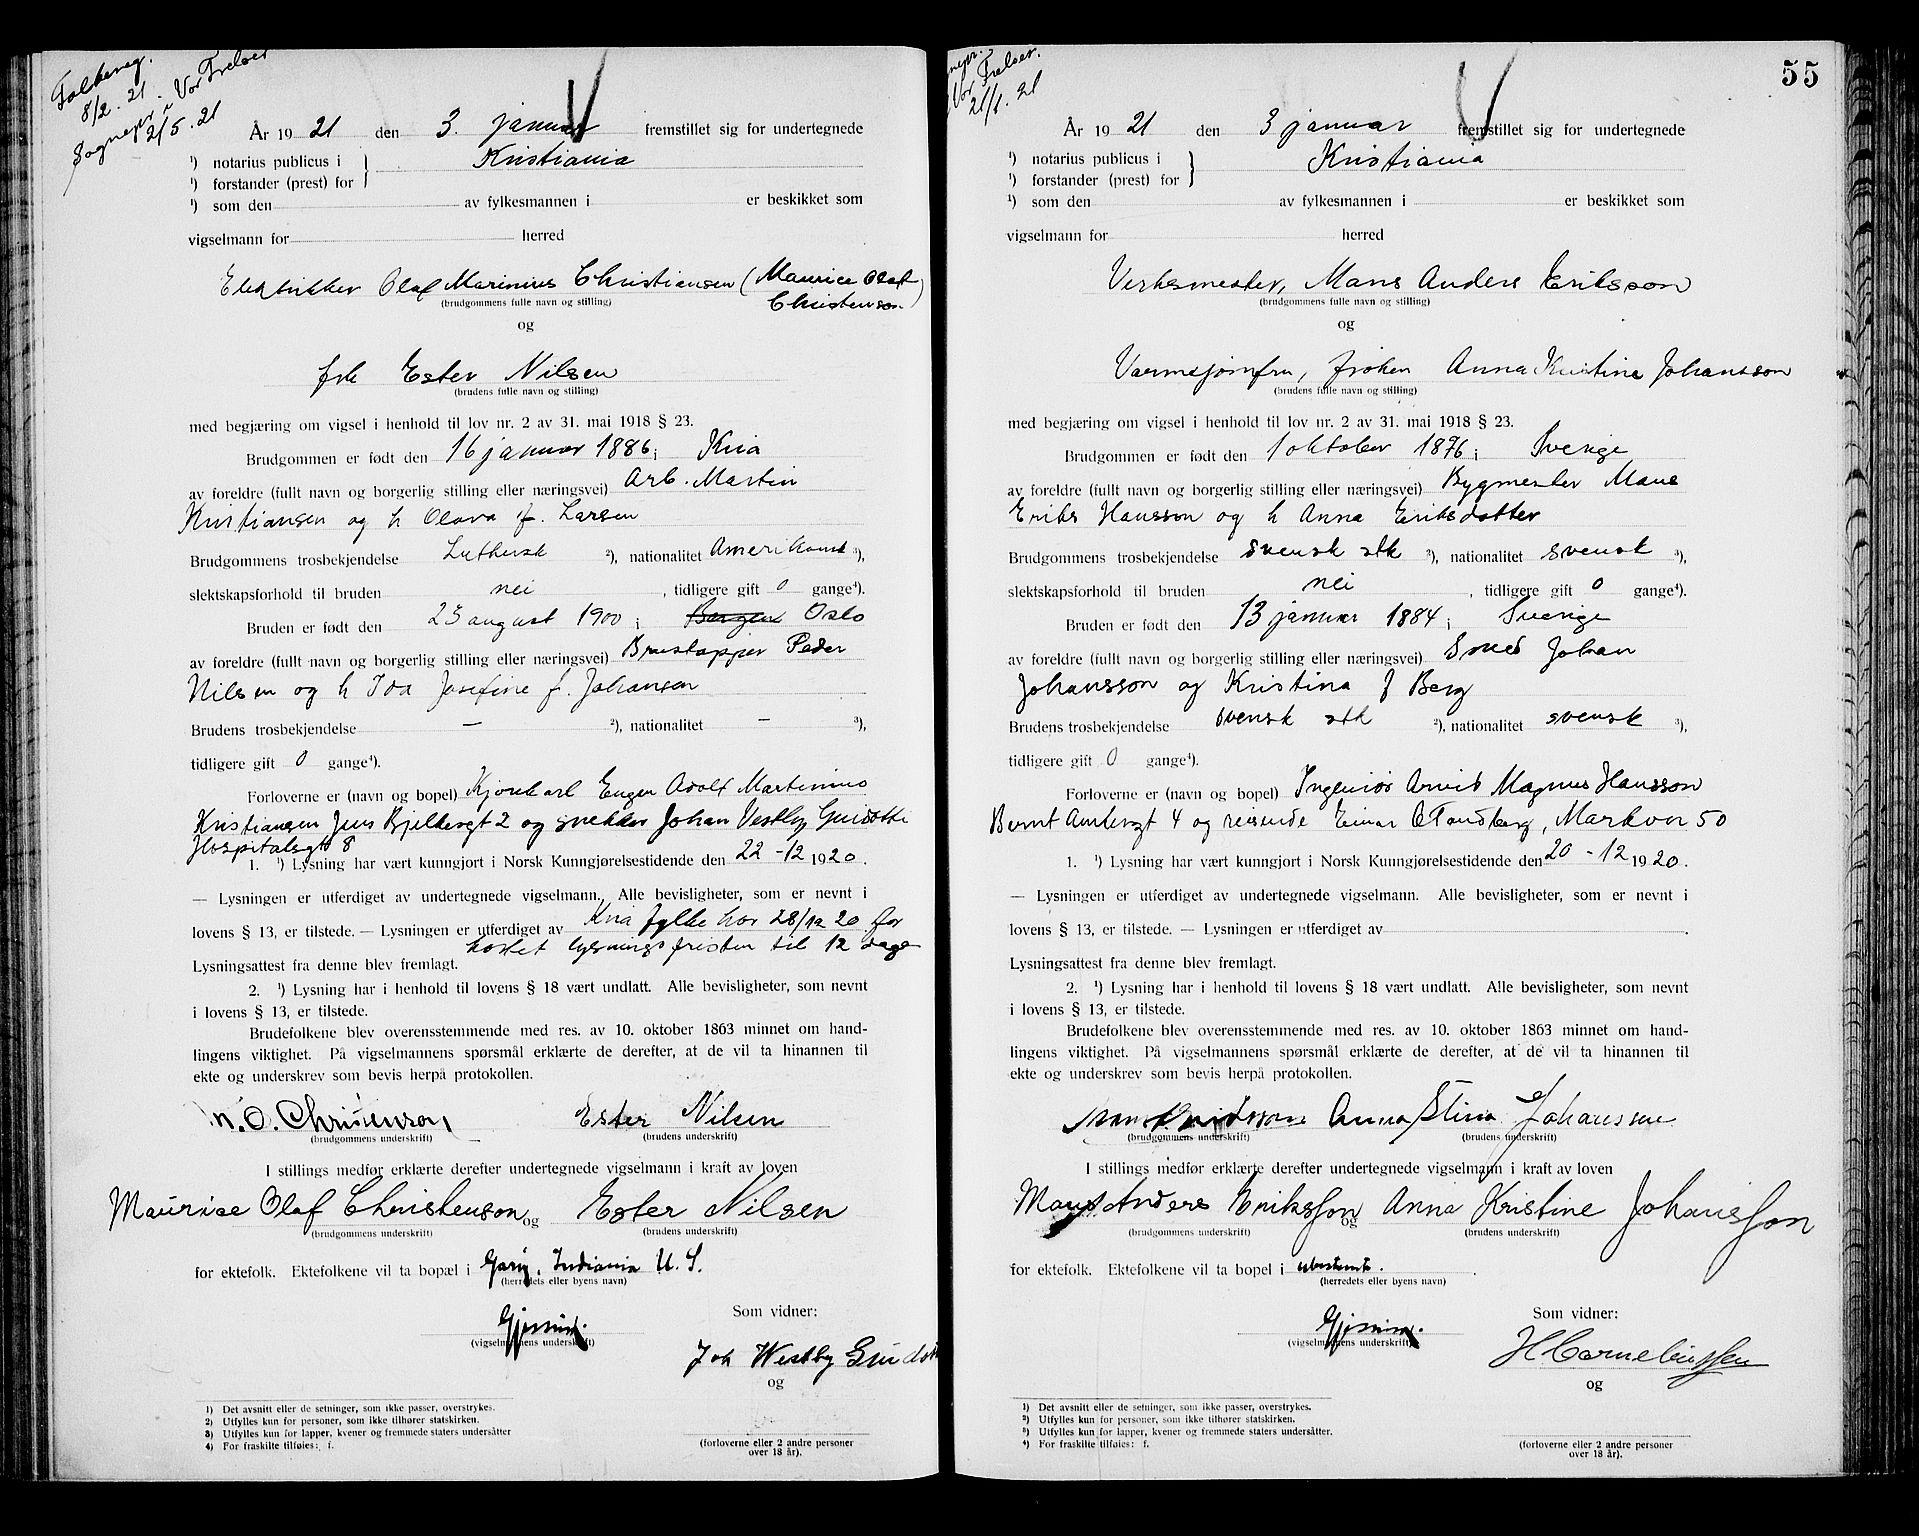 SAO, Oslo byfogd avd. I, L/Lb/Lbb/L0014: Notarialprotokoll, rekke II: Vigsler, 1920-1921, s. 54b-55a